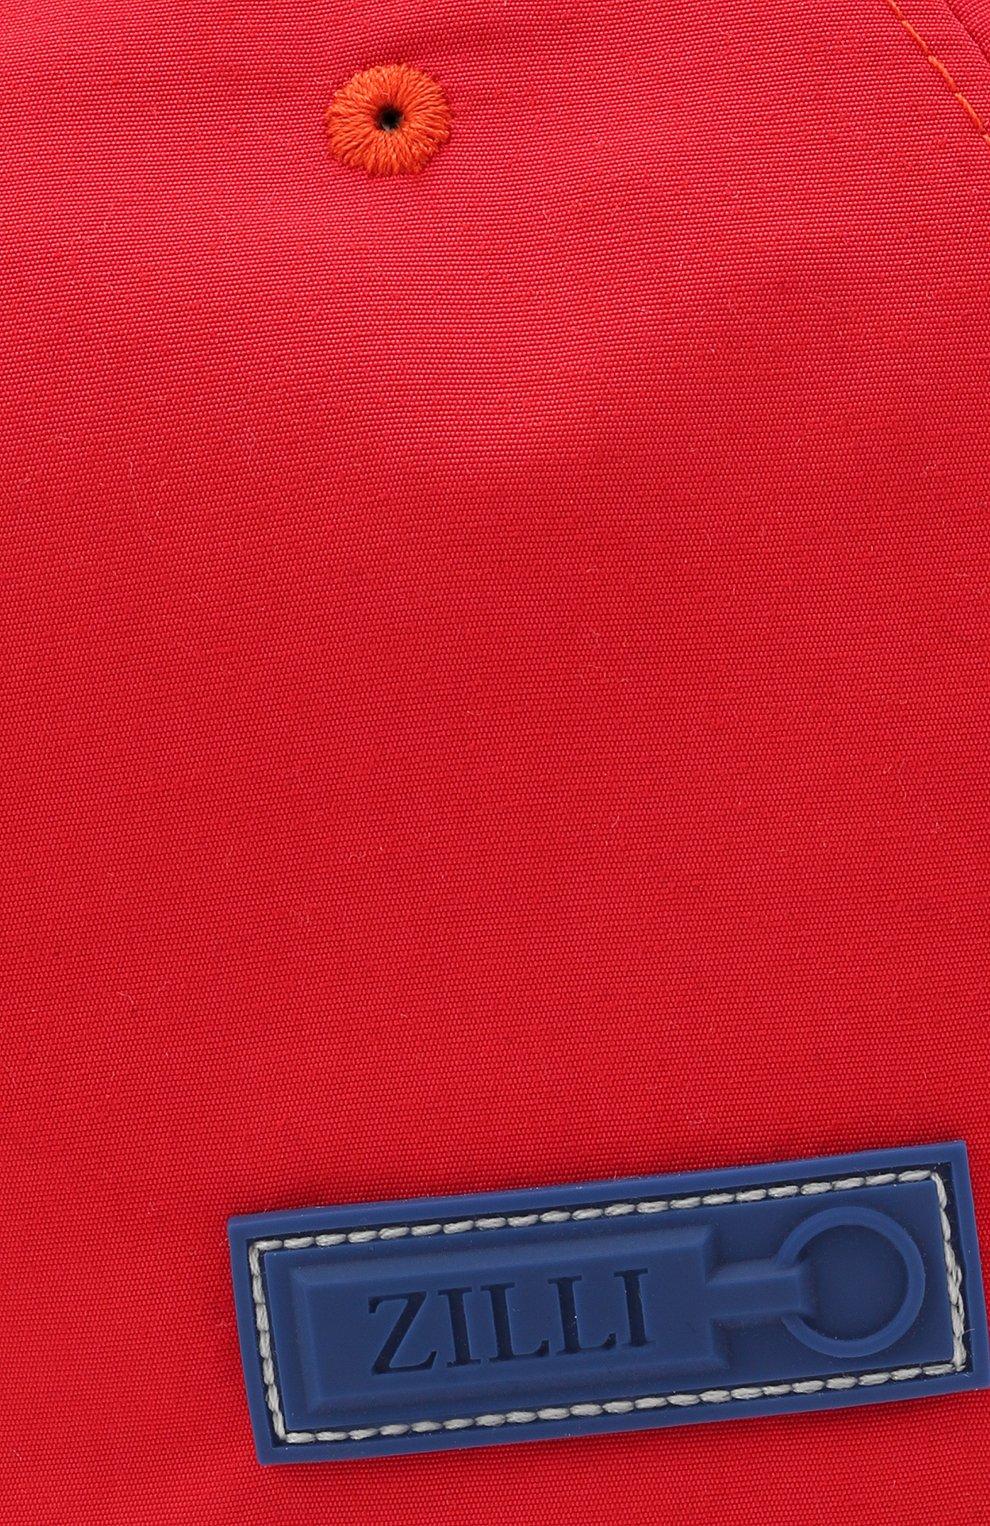 Мужской бейсболка ZILLI красного цвета, арт. MHV-CAP12-UNIC0/0001 | Фото 3 (Материал: Текстиль)